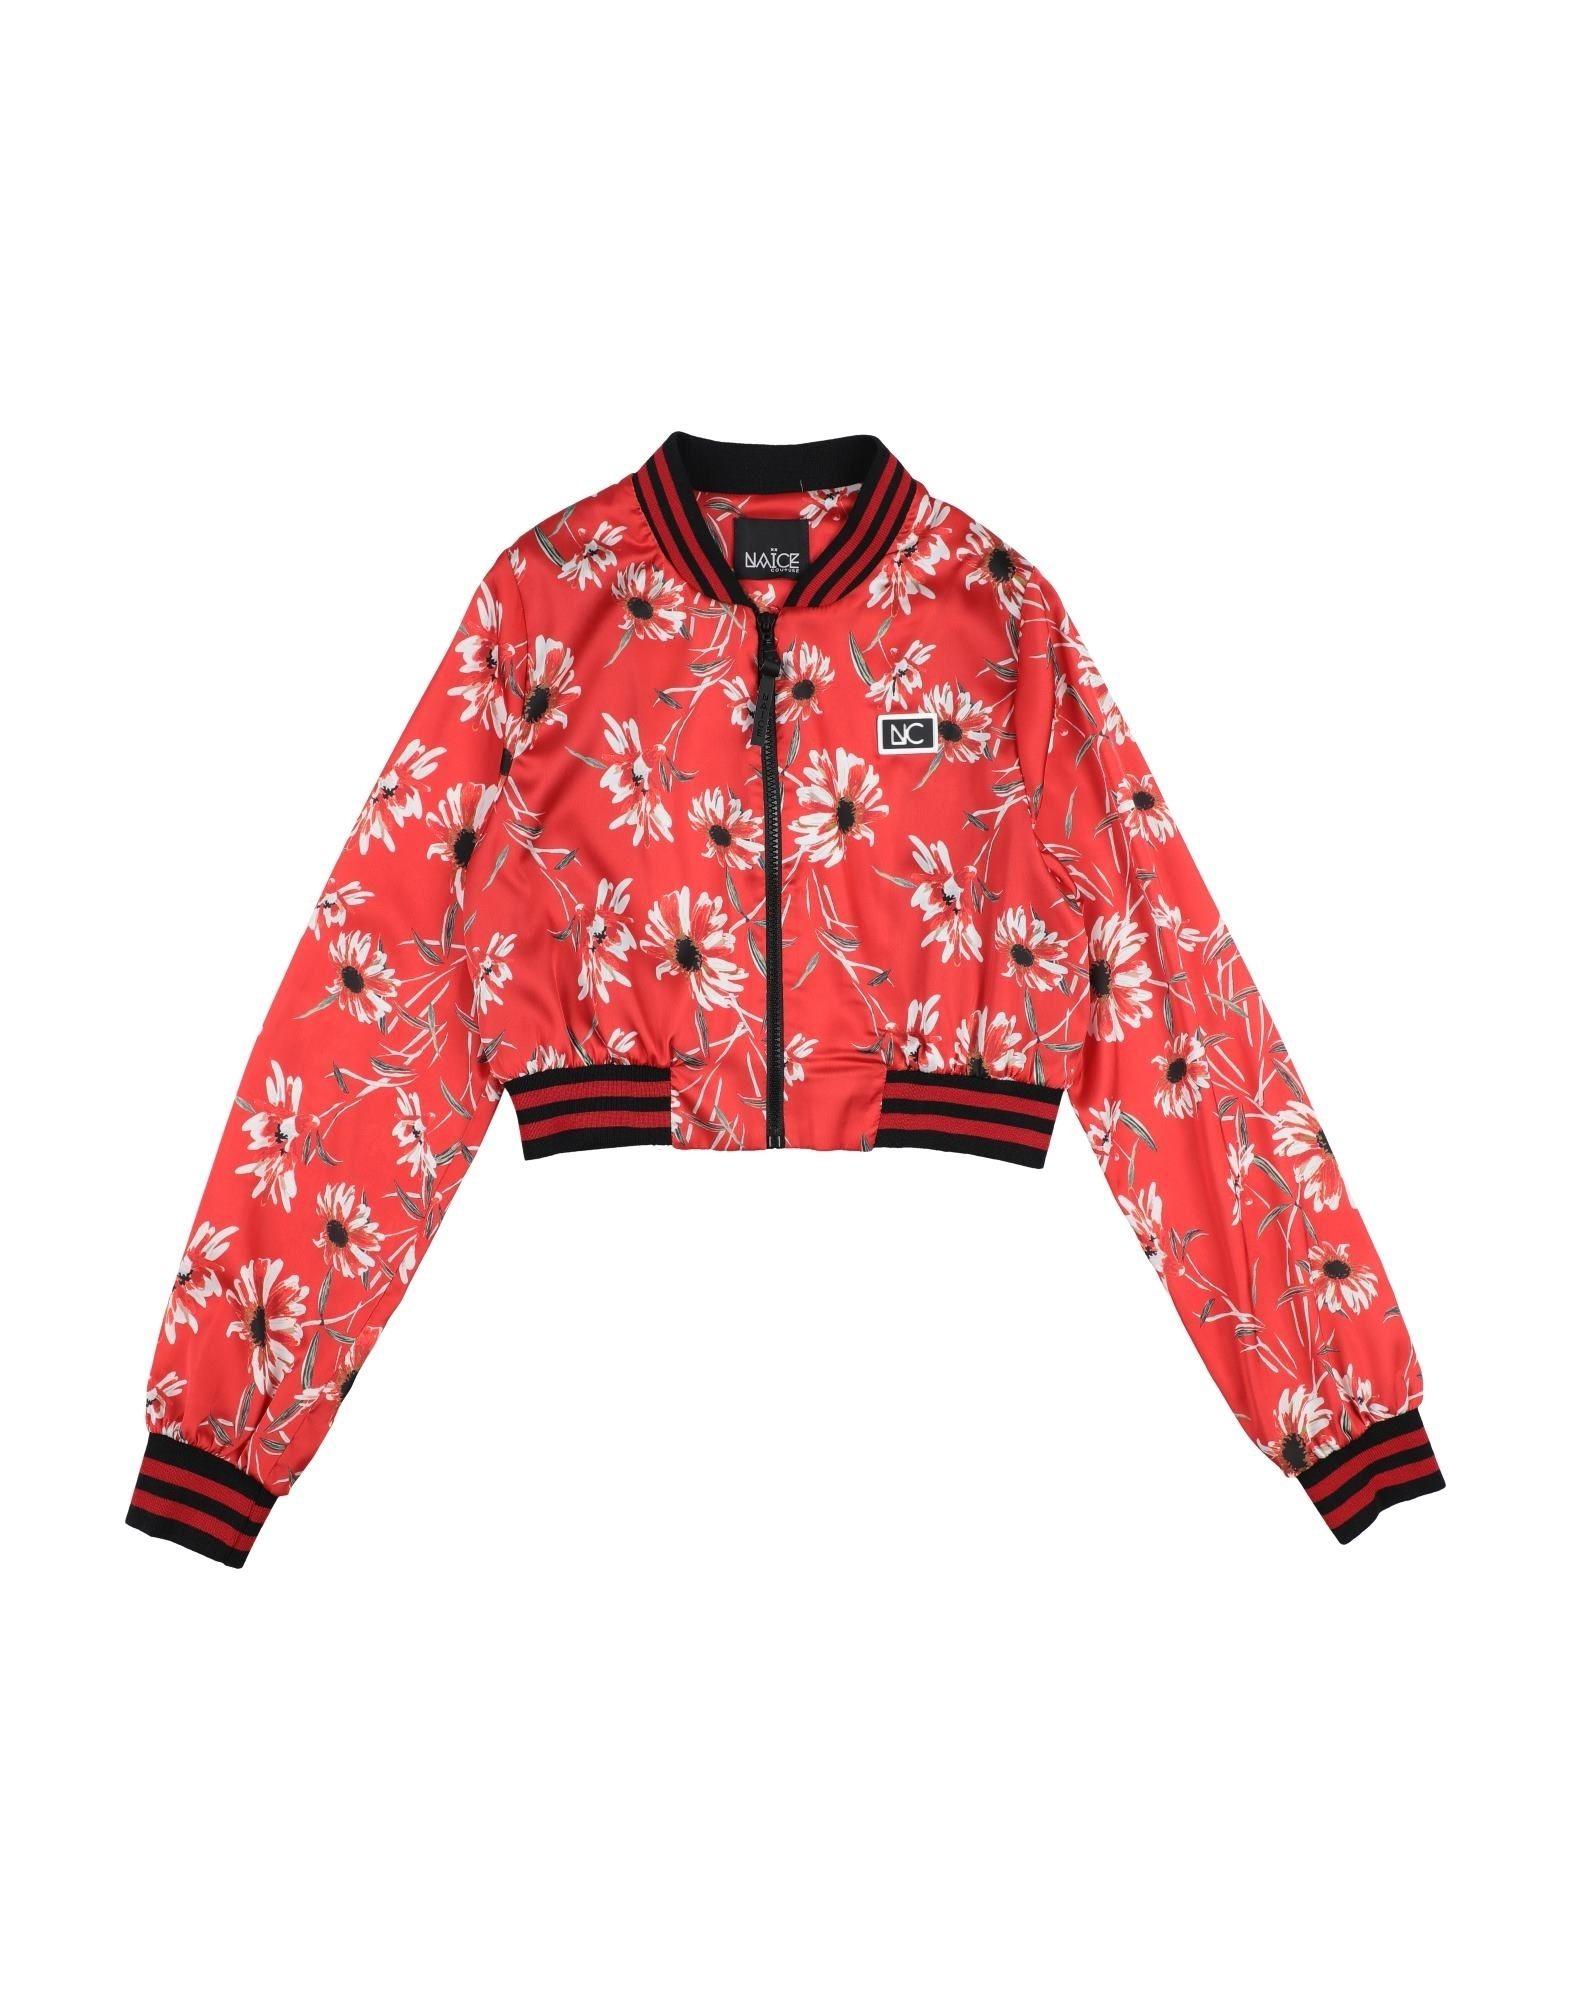 Naïce Kids' Jackets In Red